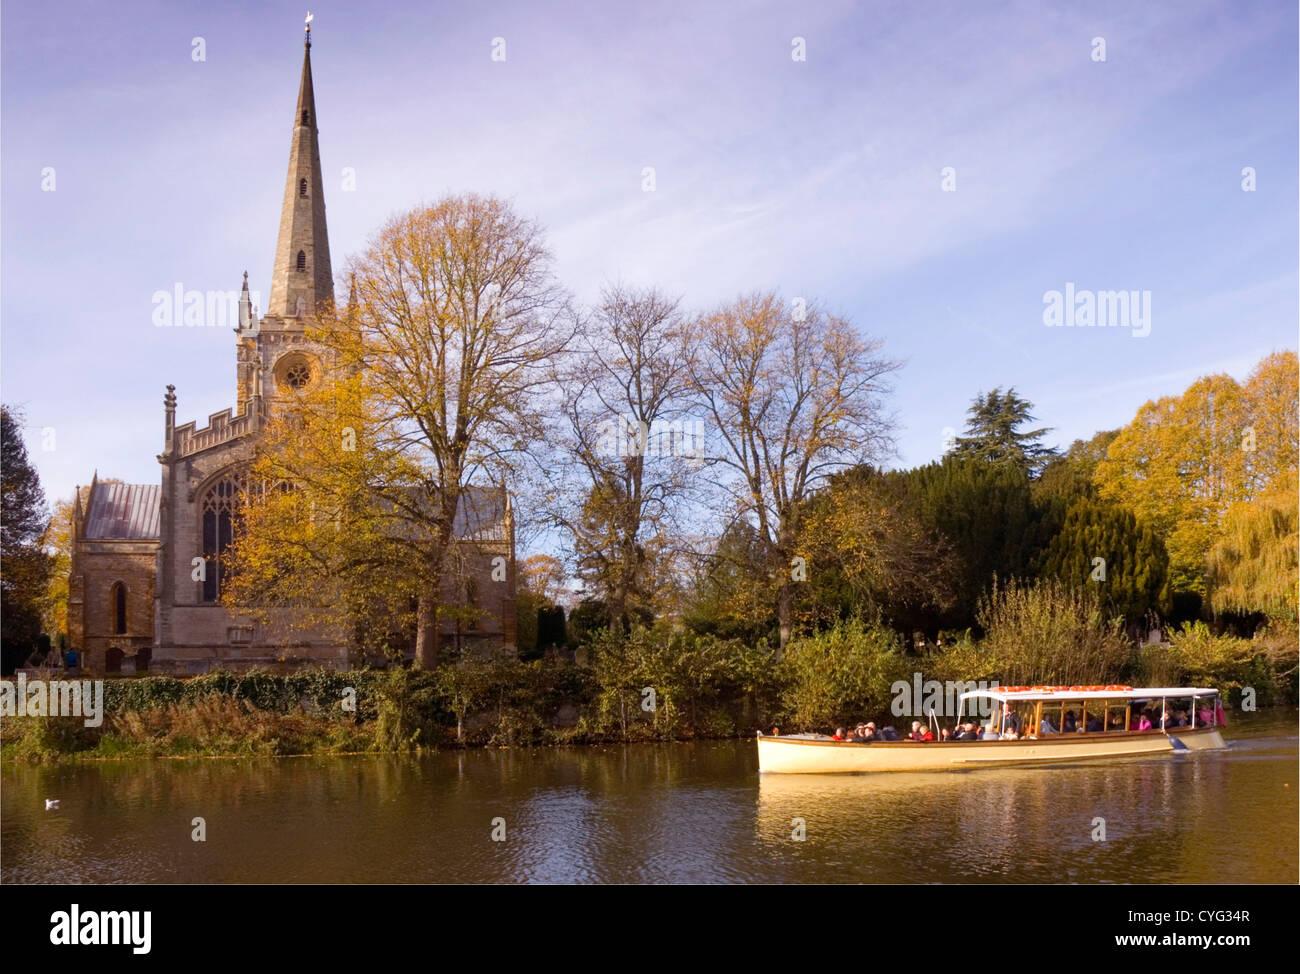 Warwickshire - Stratford upon Avon - river scene - tourist river cruise - passing Holy Trinity - autumn sunlight - Stock Image